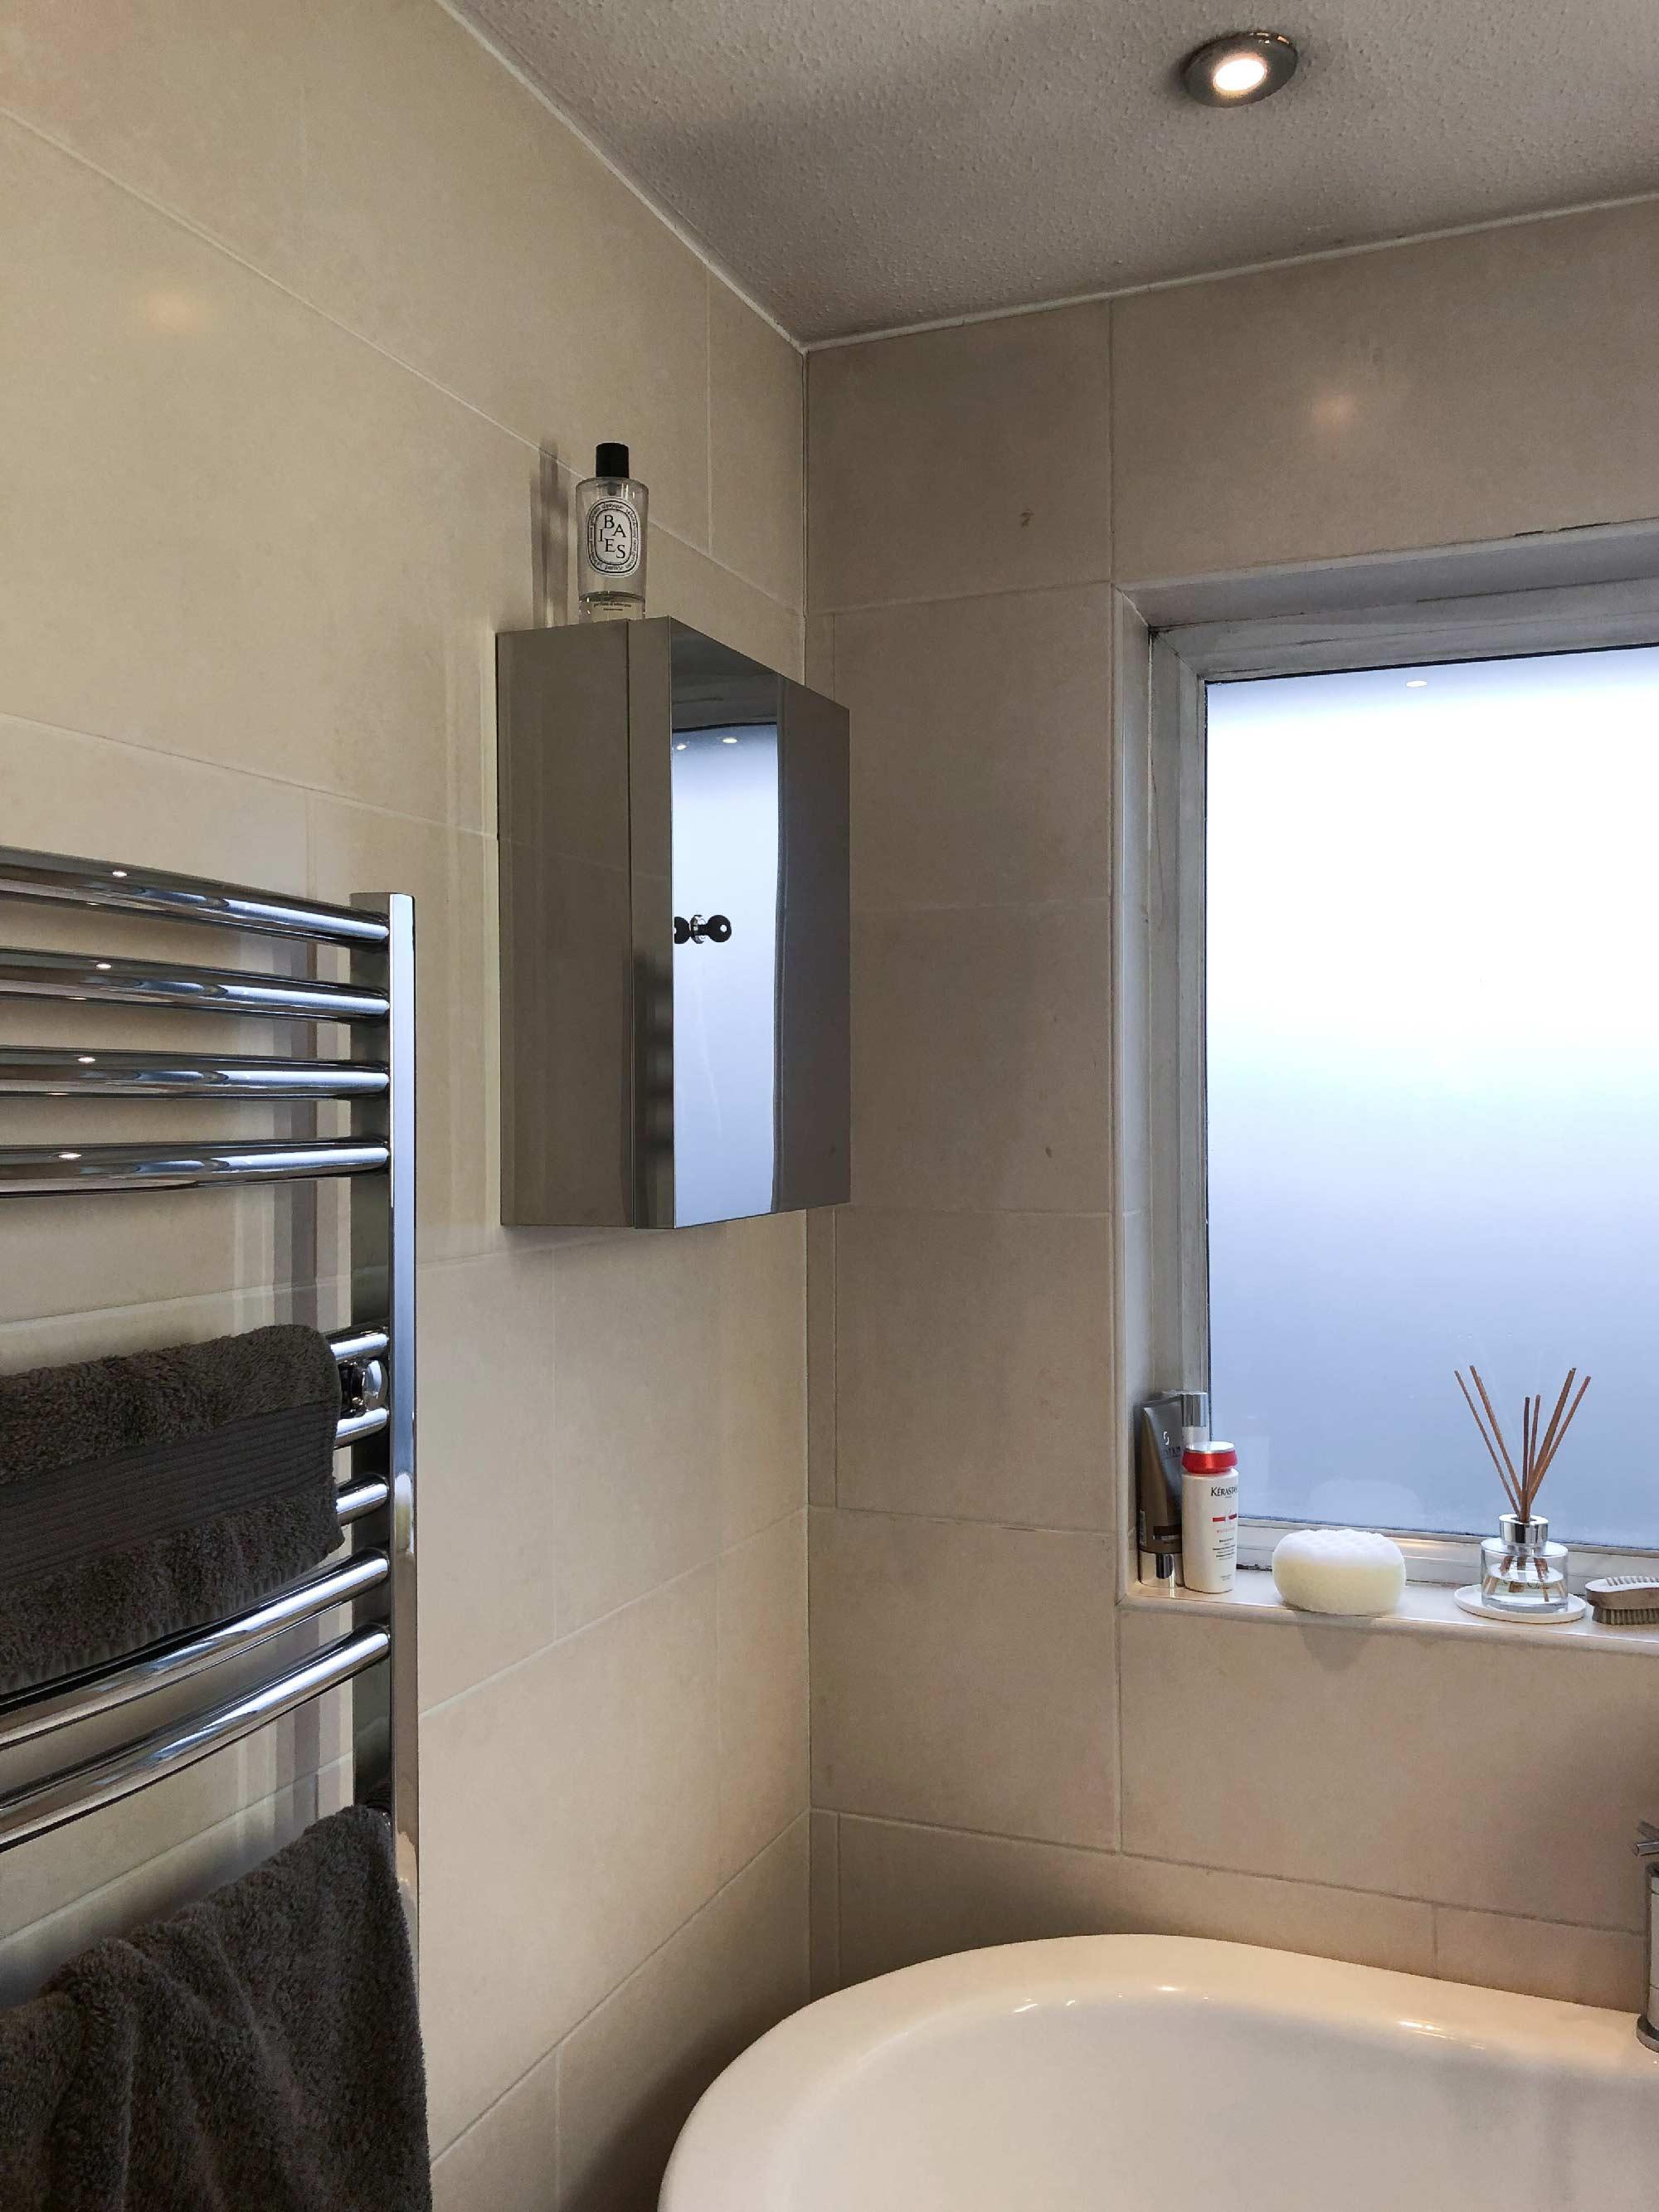 3 bathroom-renovation-before-photo.jpg